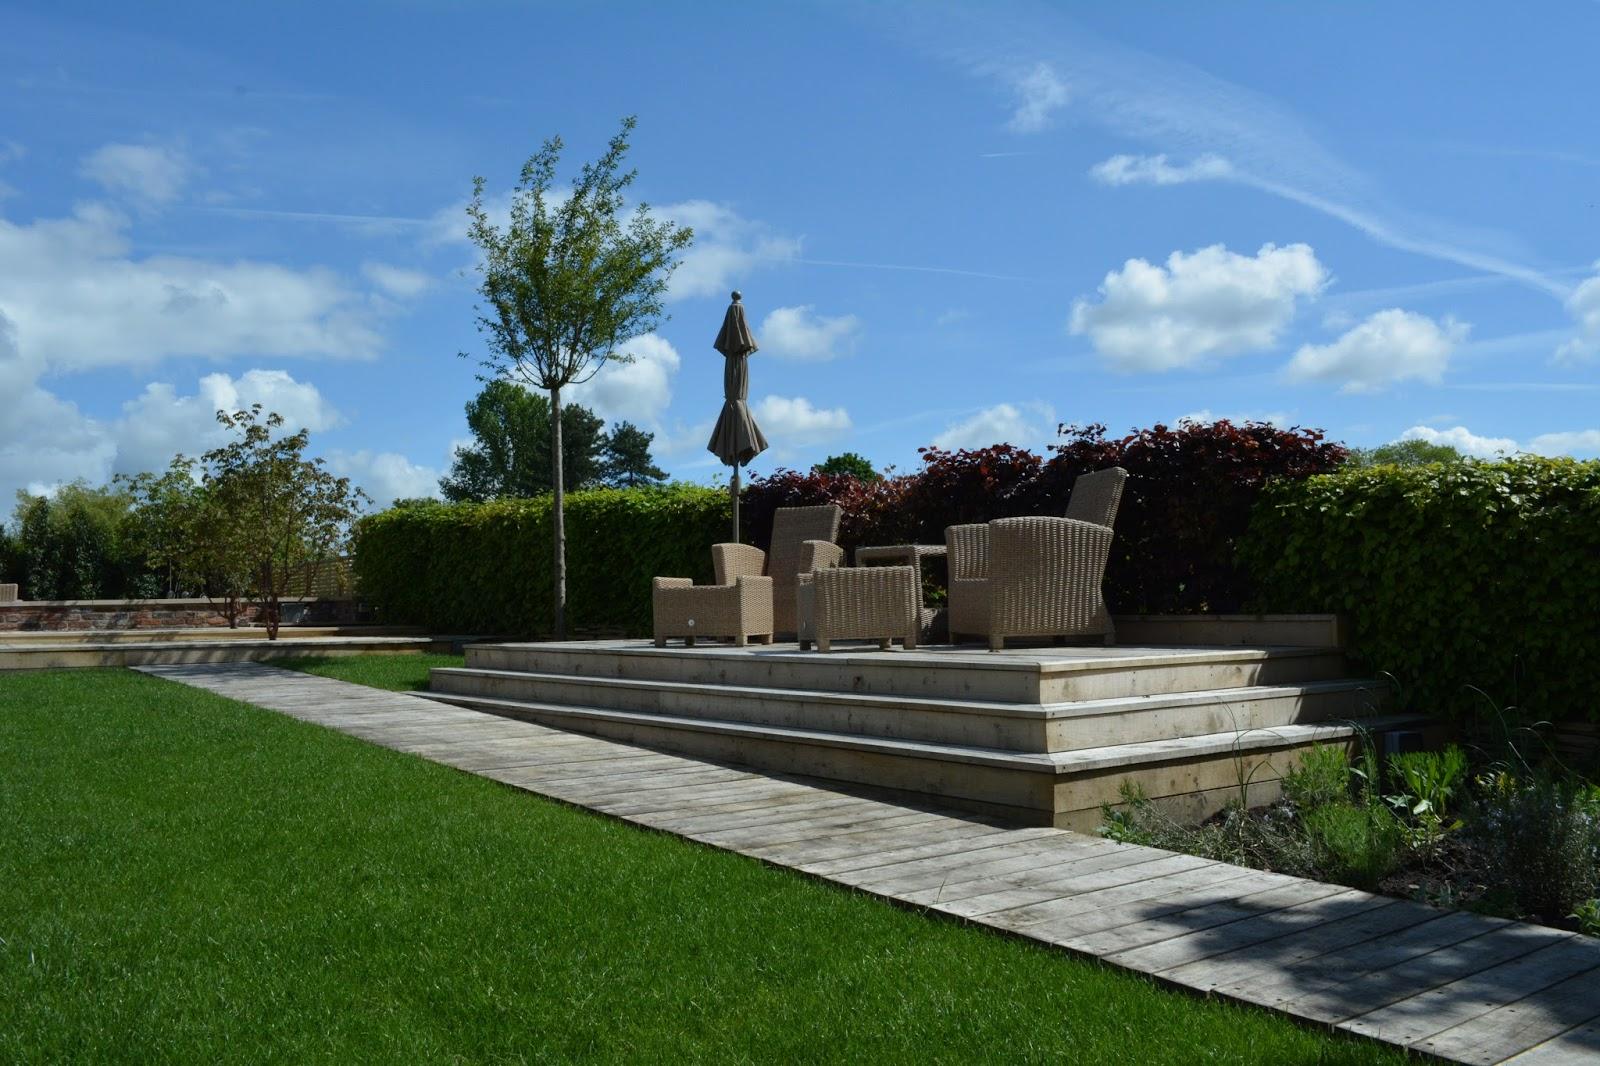 David Keegans Garden Design Blog May 2015